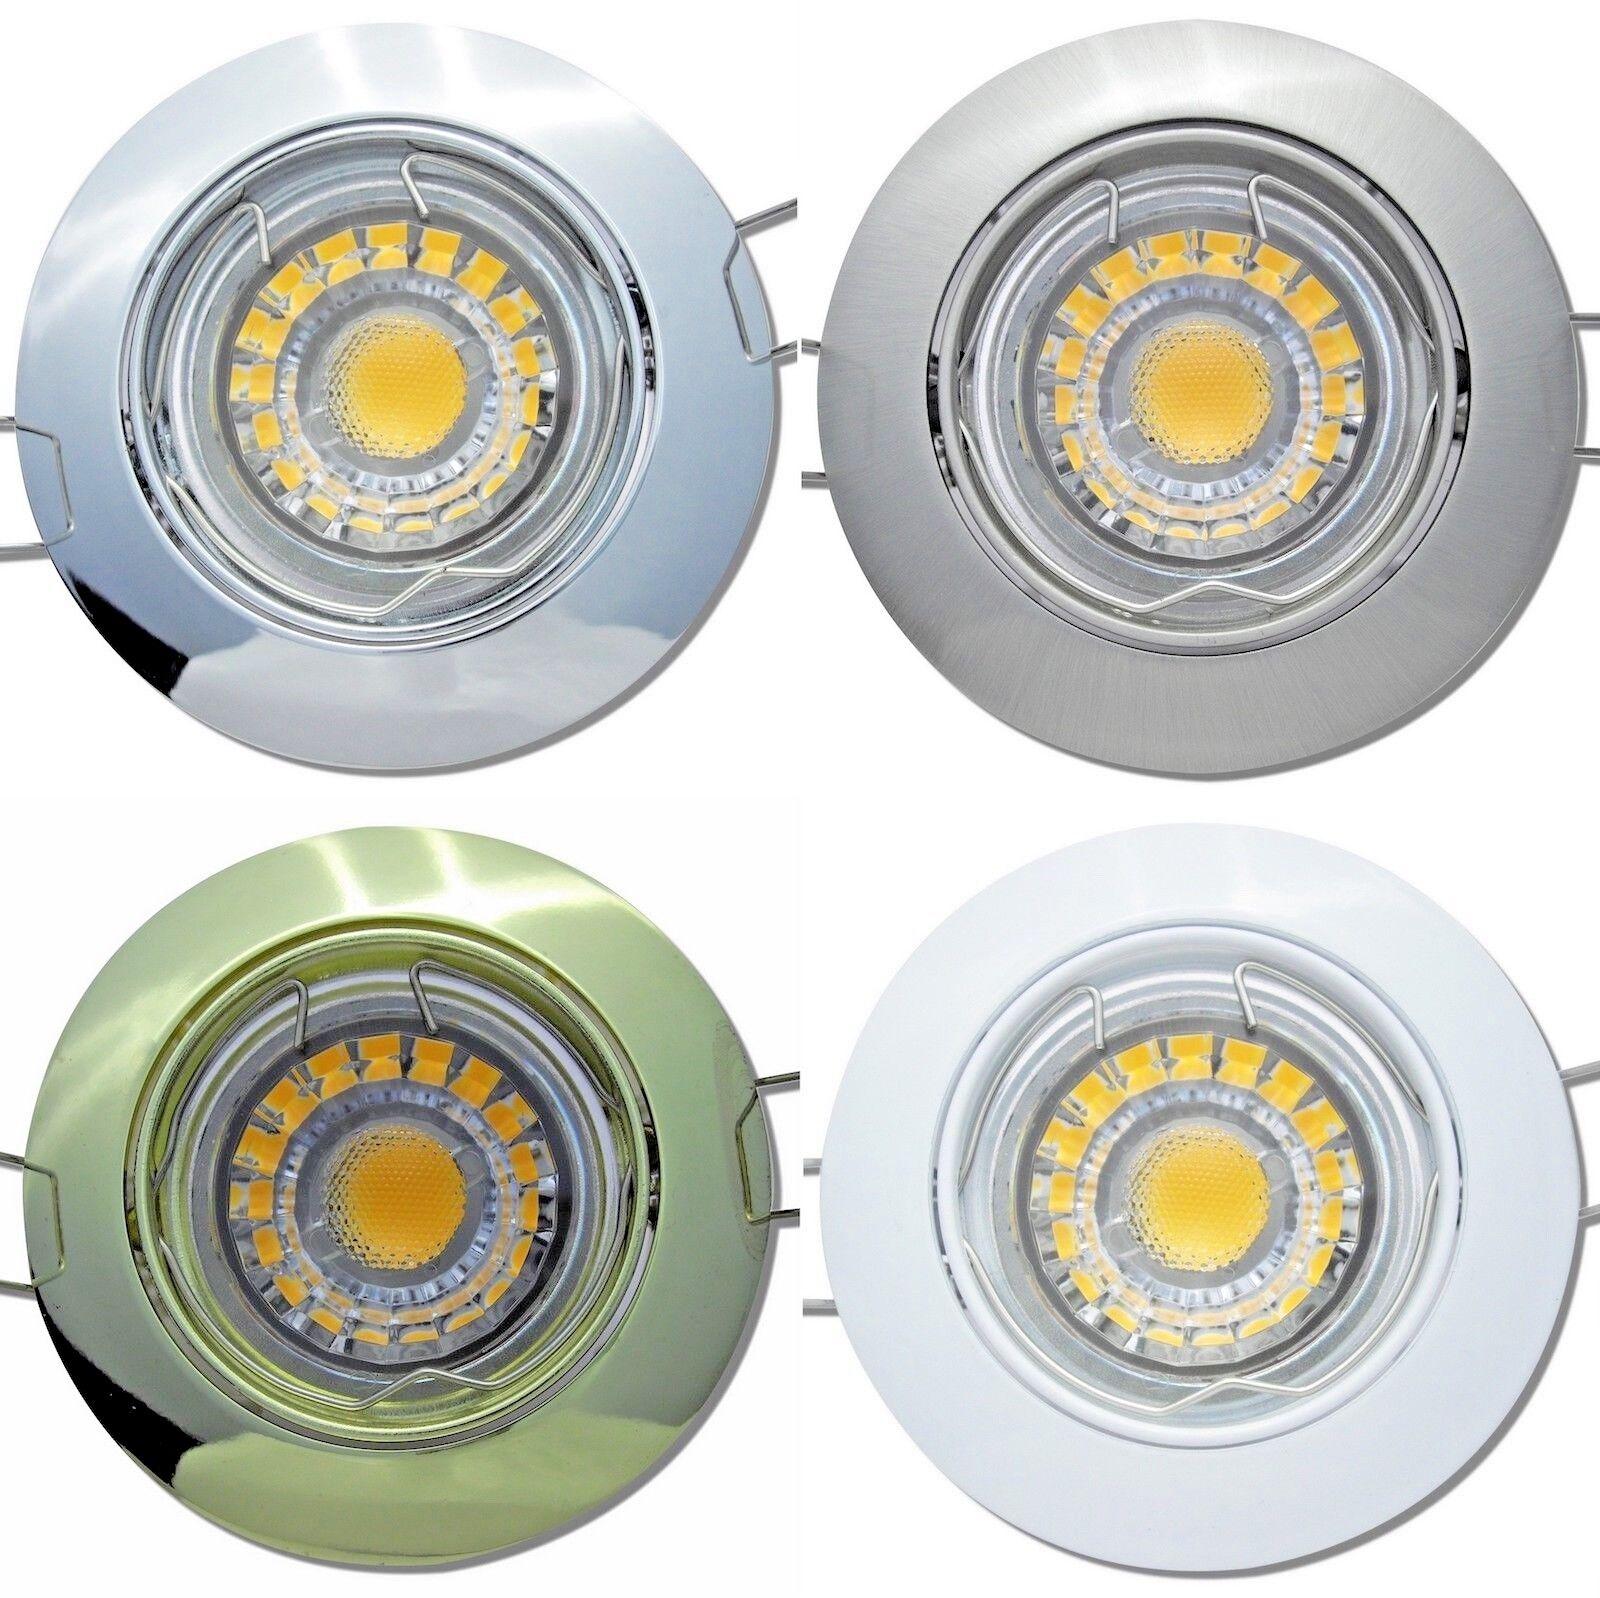 6er Set LED Einbaustrahler Jan 230Volt GU10 Deckeneinbauspots + 5Watt COB LED